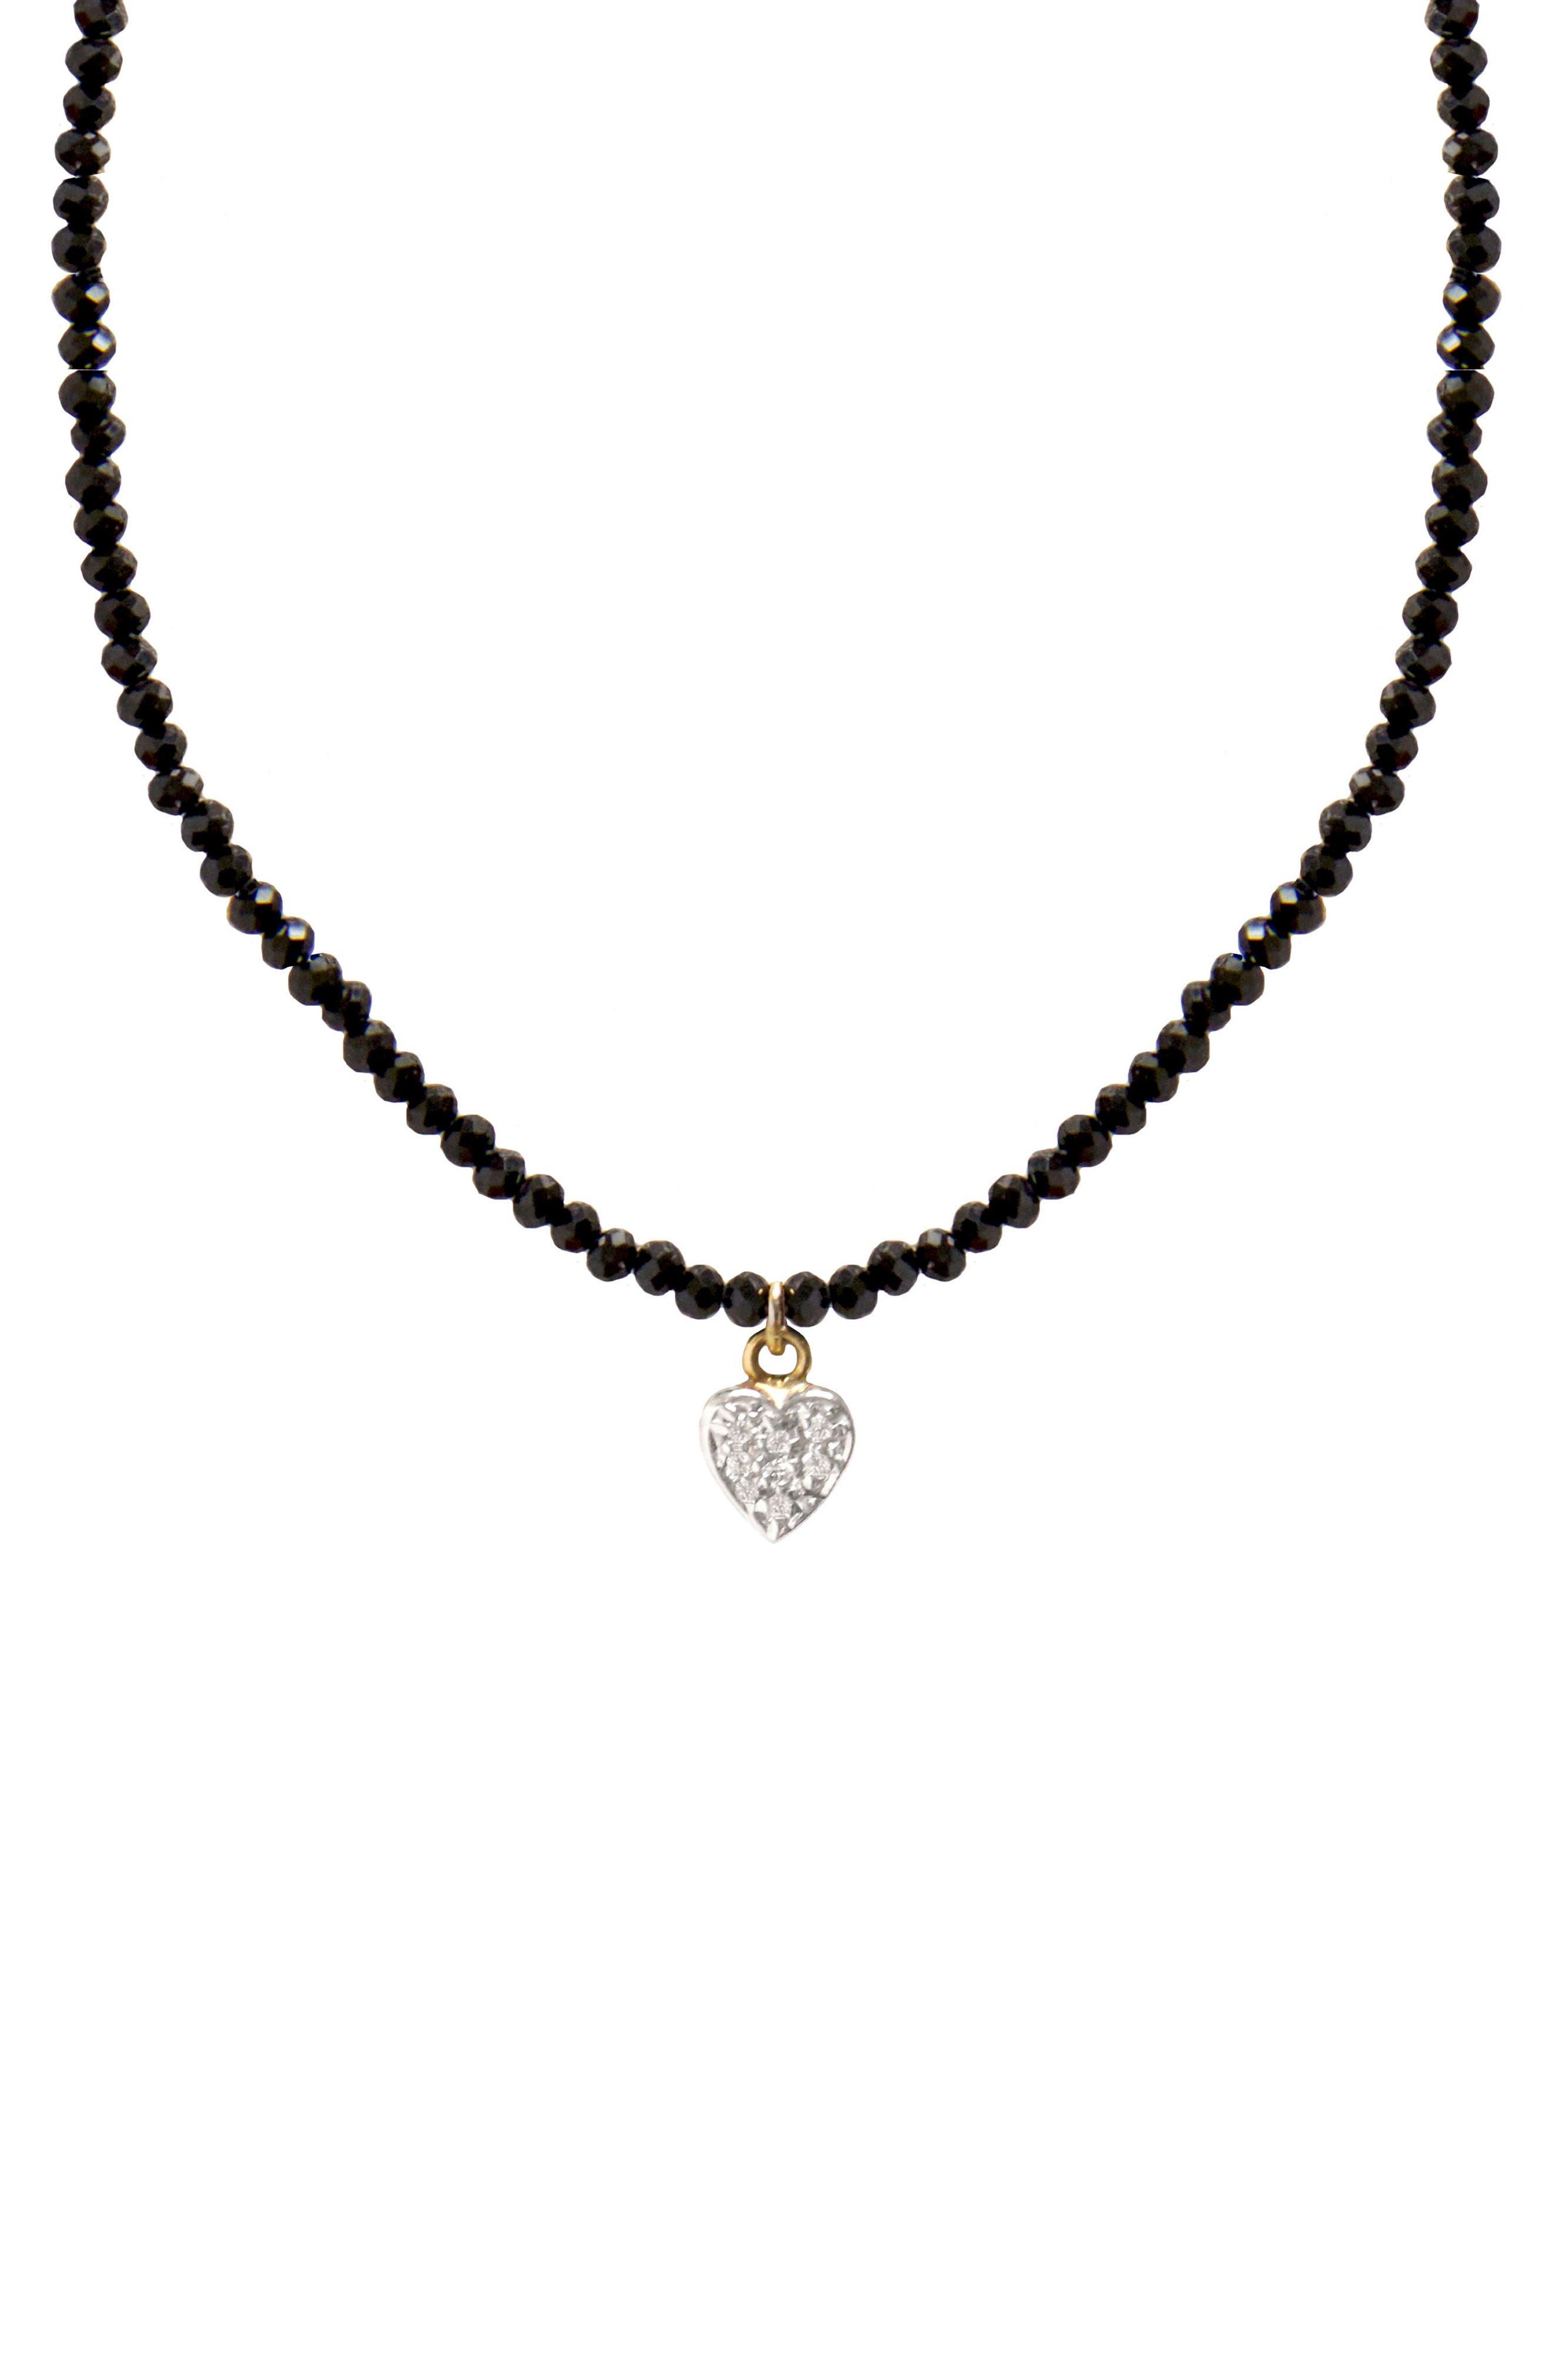 Jane Basch Diamond Star Necklace,                             Main thumbnail 1, color,                             Black Onyx